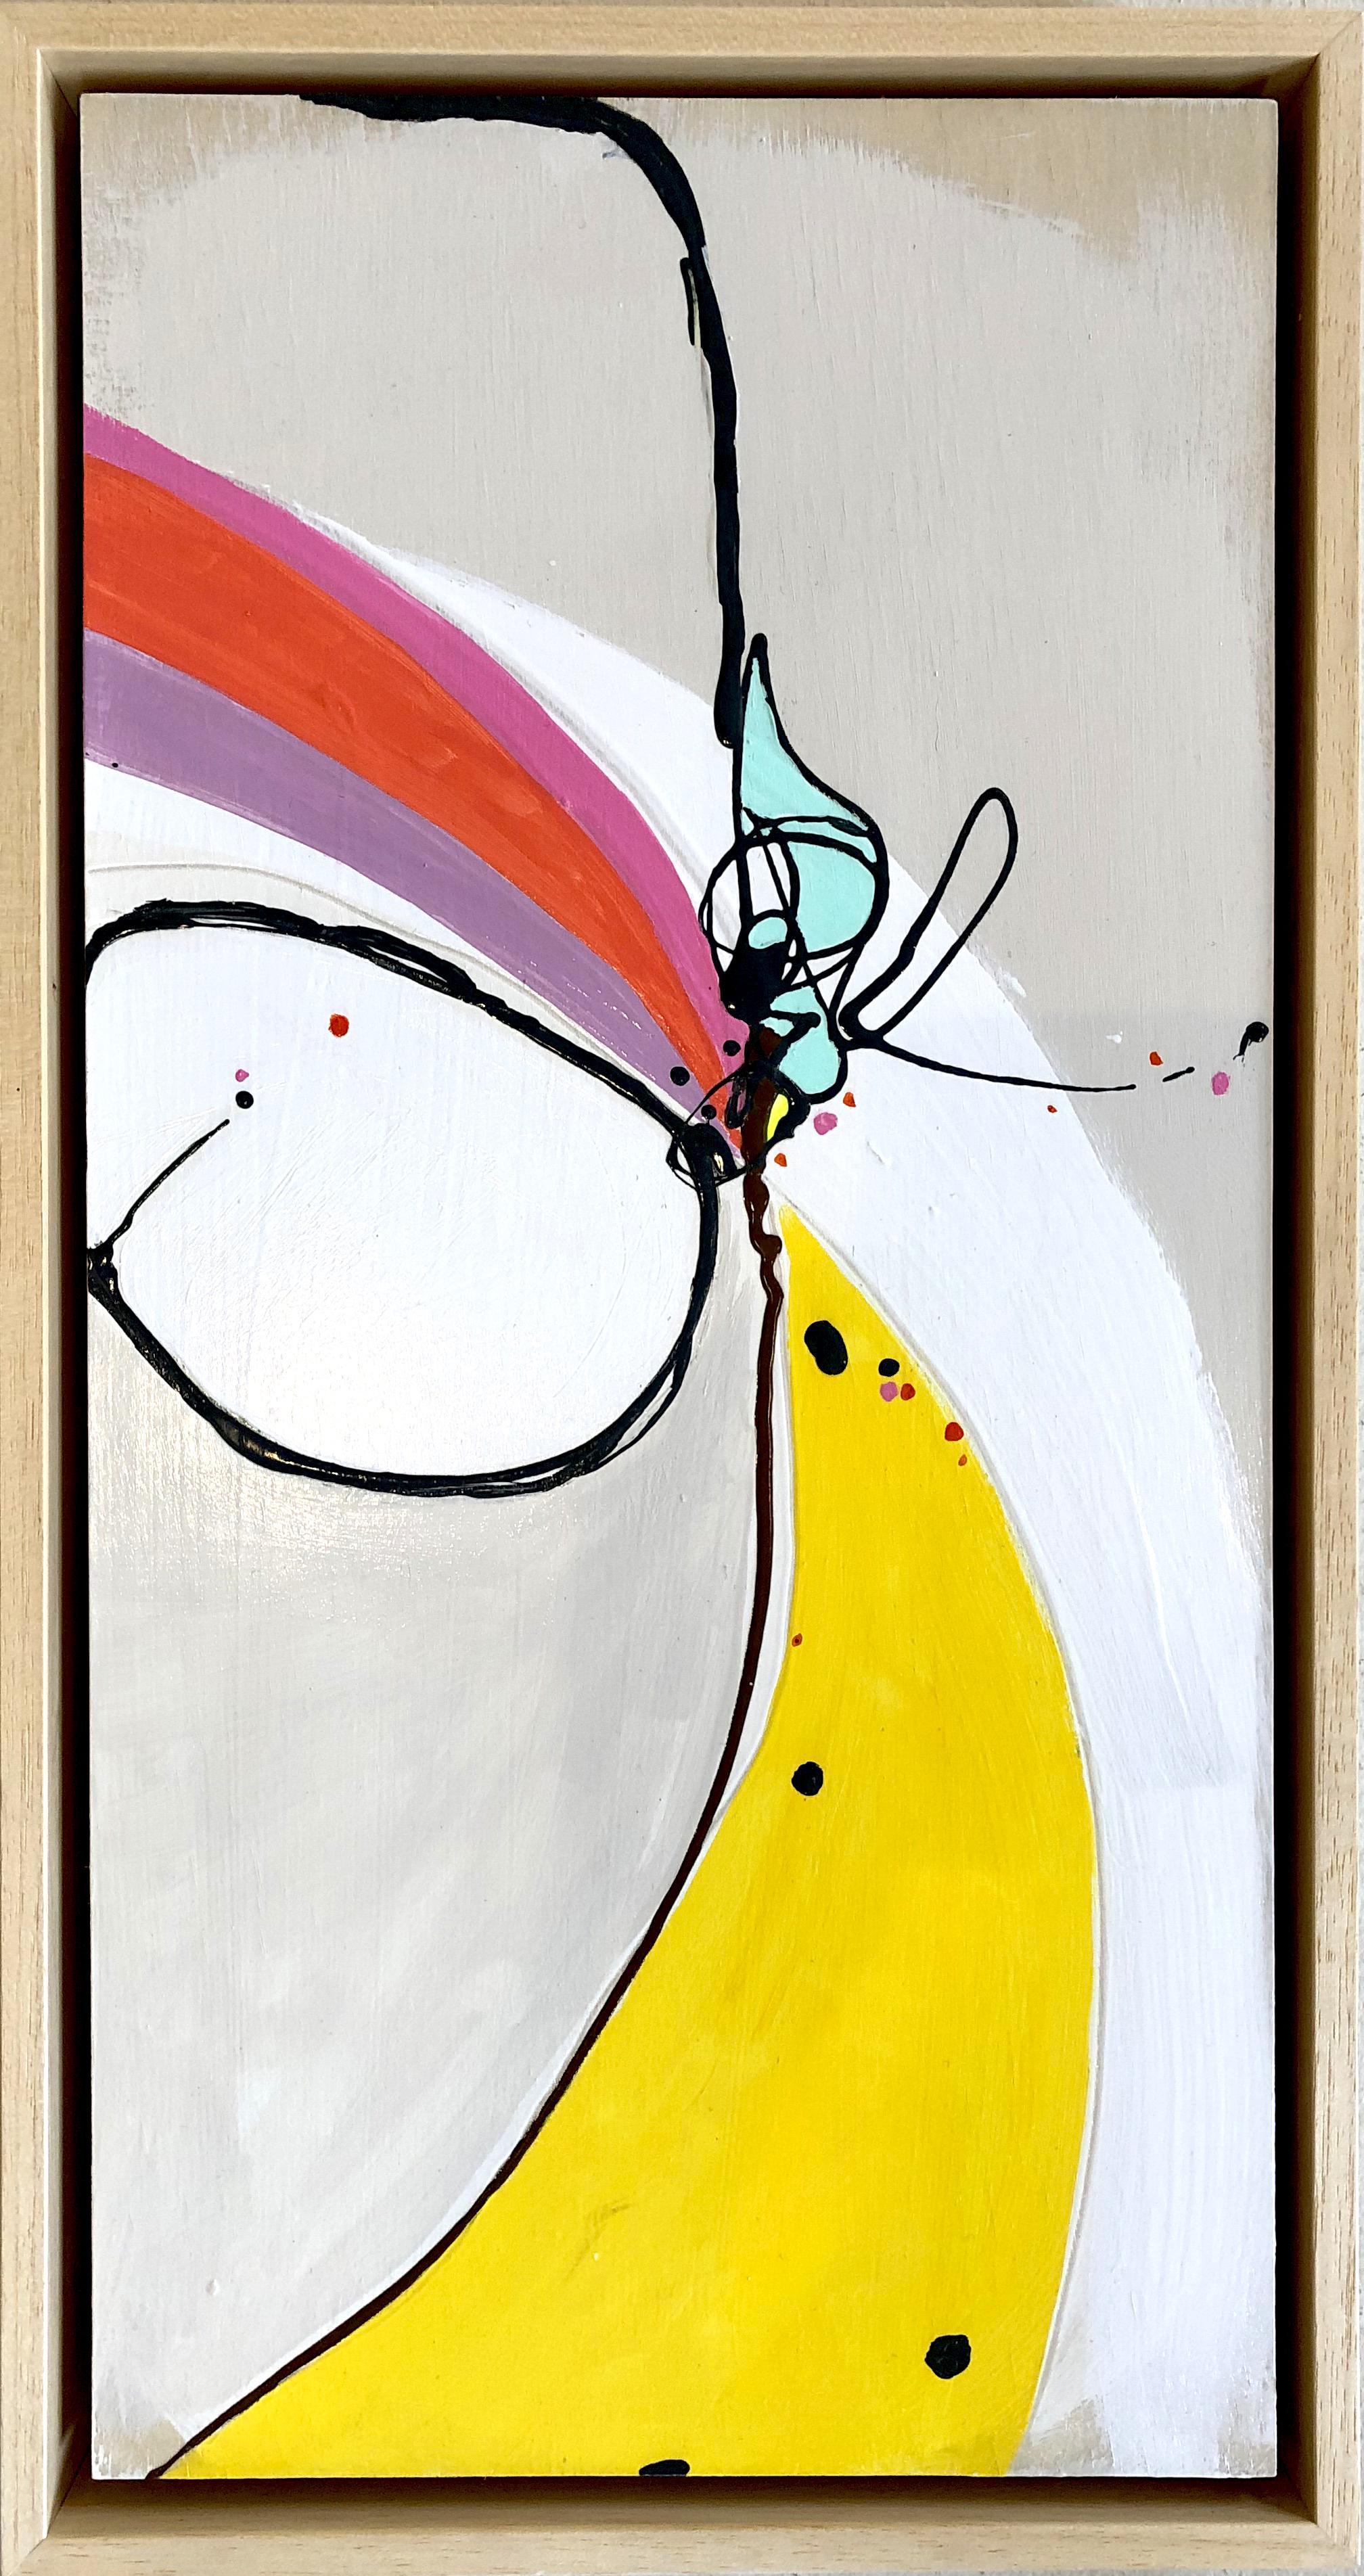 "Fireworks 4 - 11.5"" x 21.5""Mixed media on paper, mounted on panel, framedSOLD"